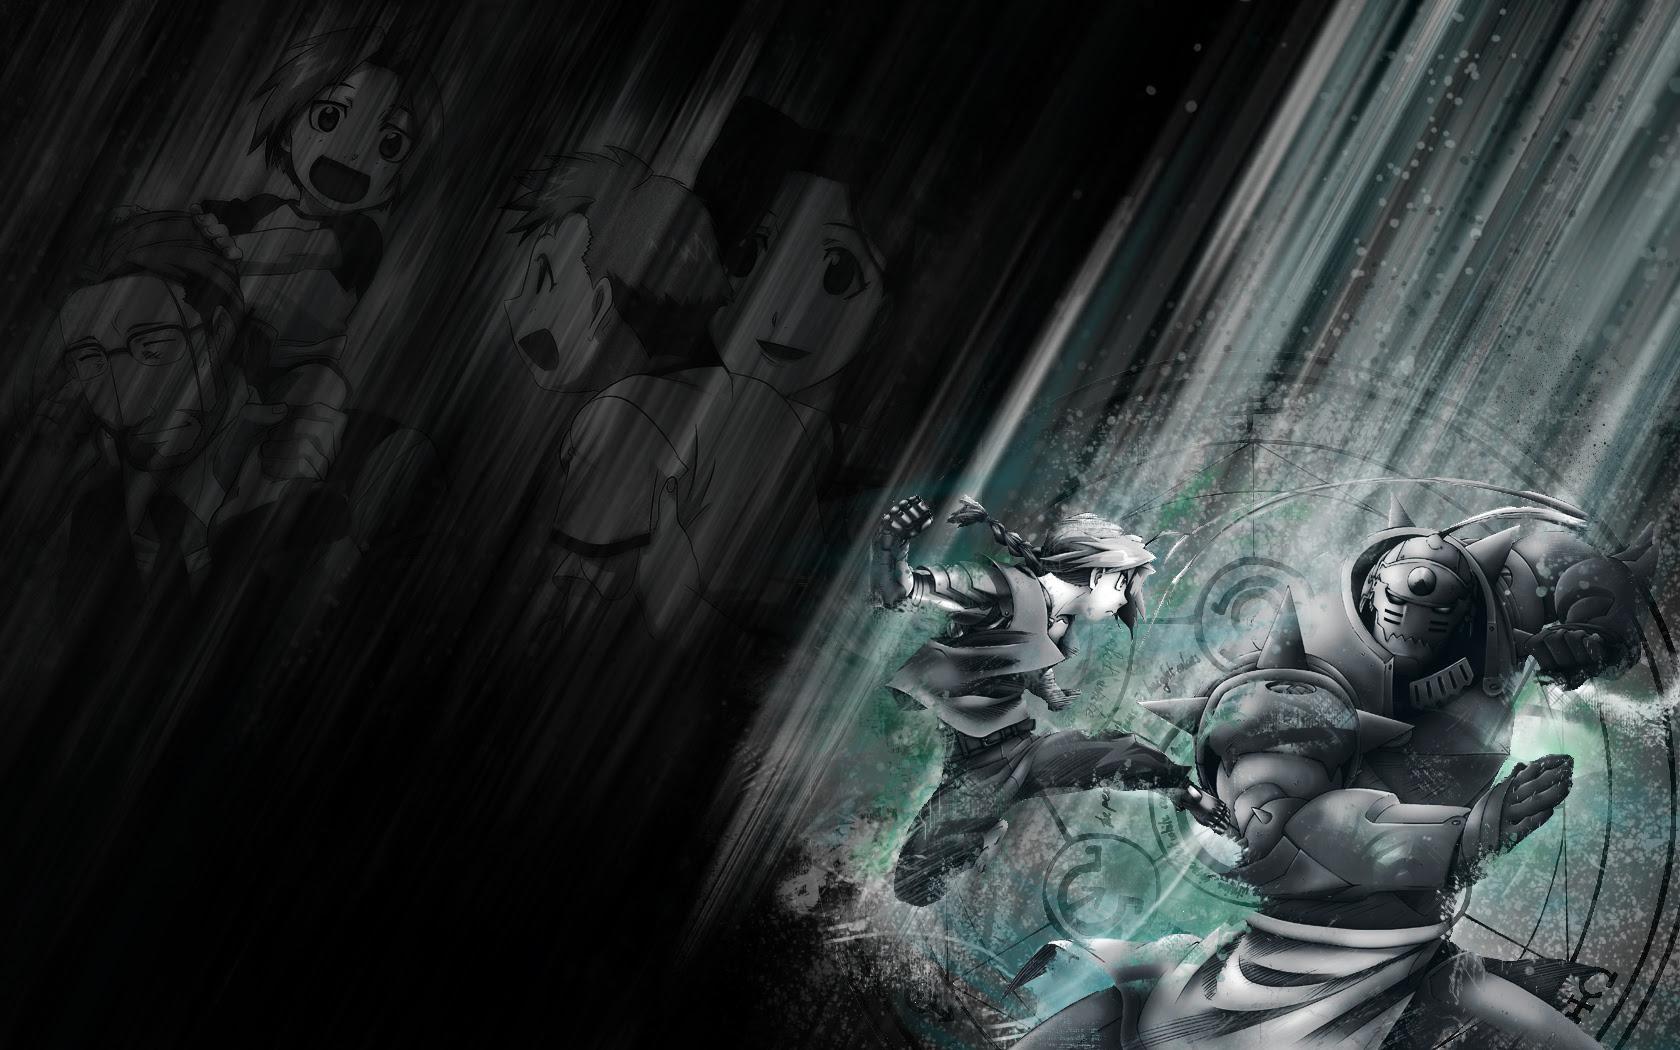 Fullmetal Alchemist Brotherhood Background Posted By Samantha Johnson